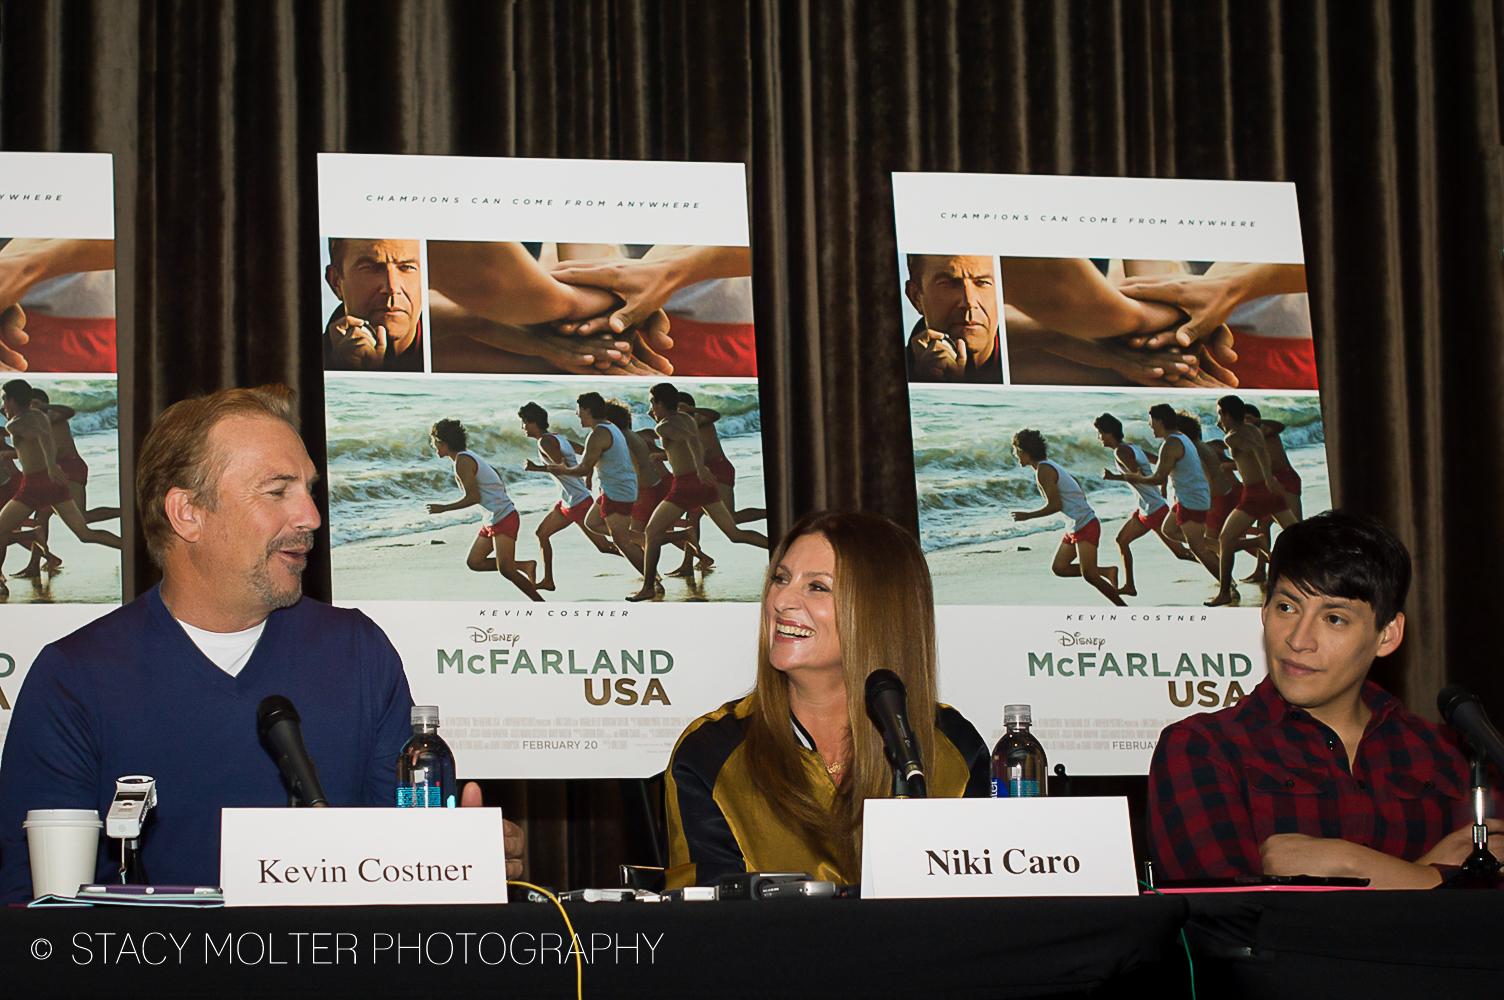 Kevin Costner, Niki Caro, Carlos Pratts - McFarland USA Press Conference Junket